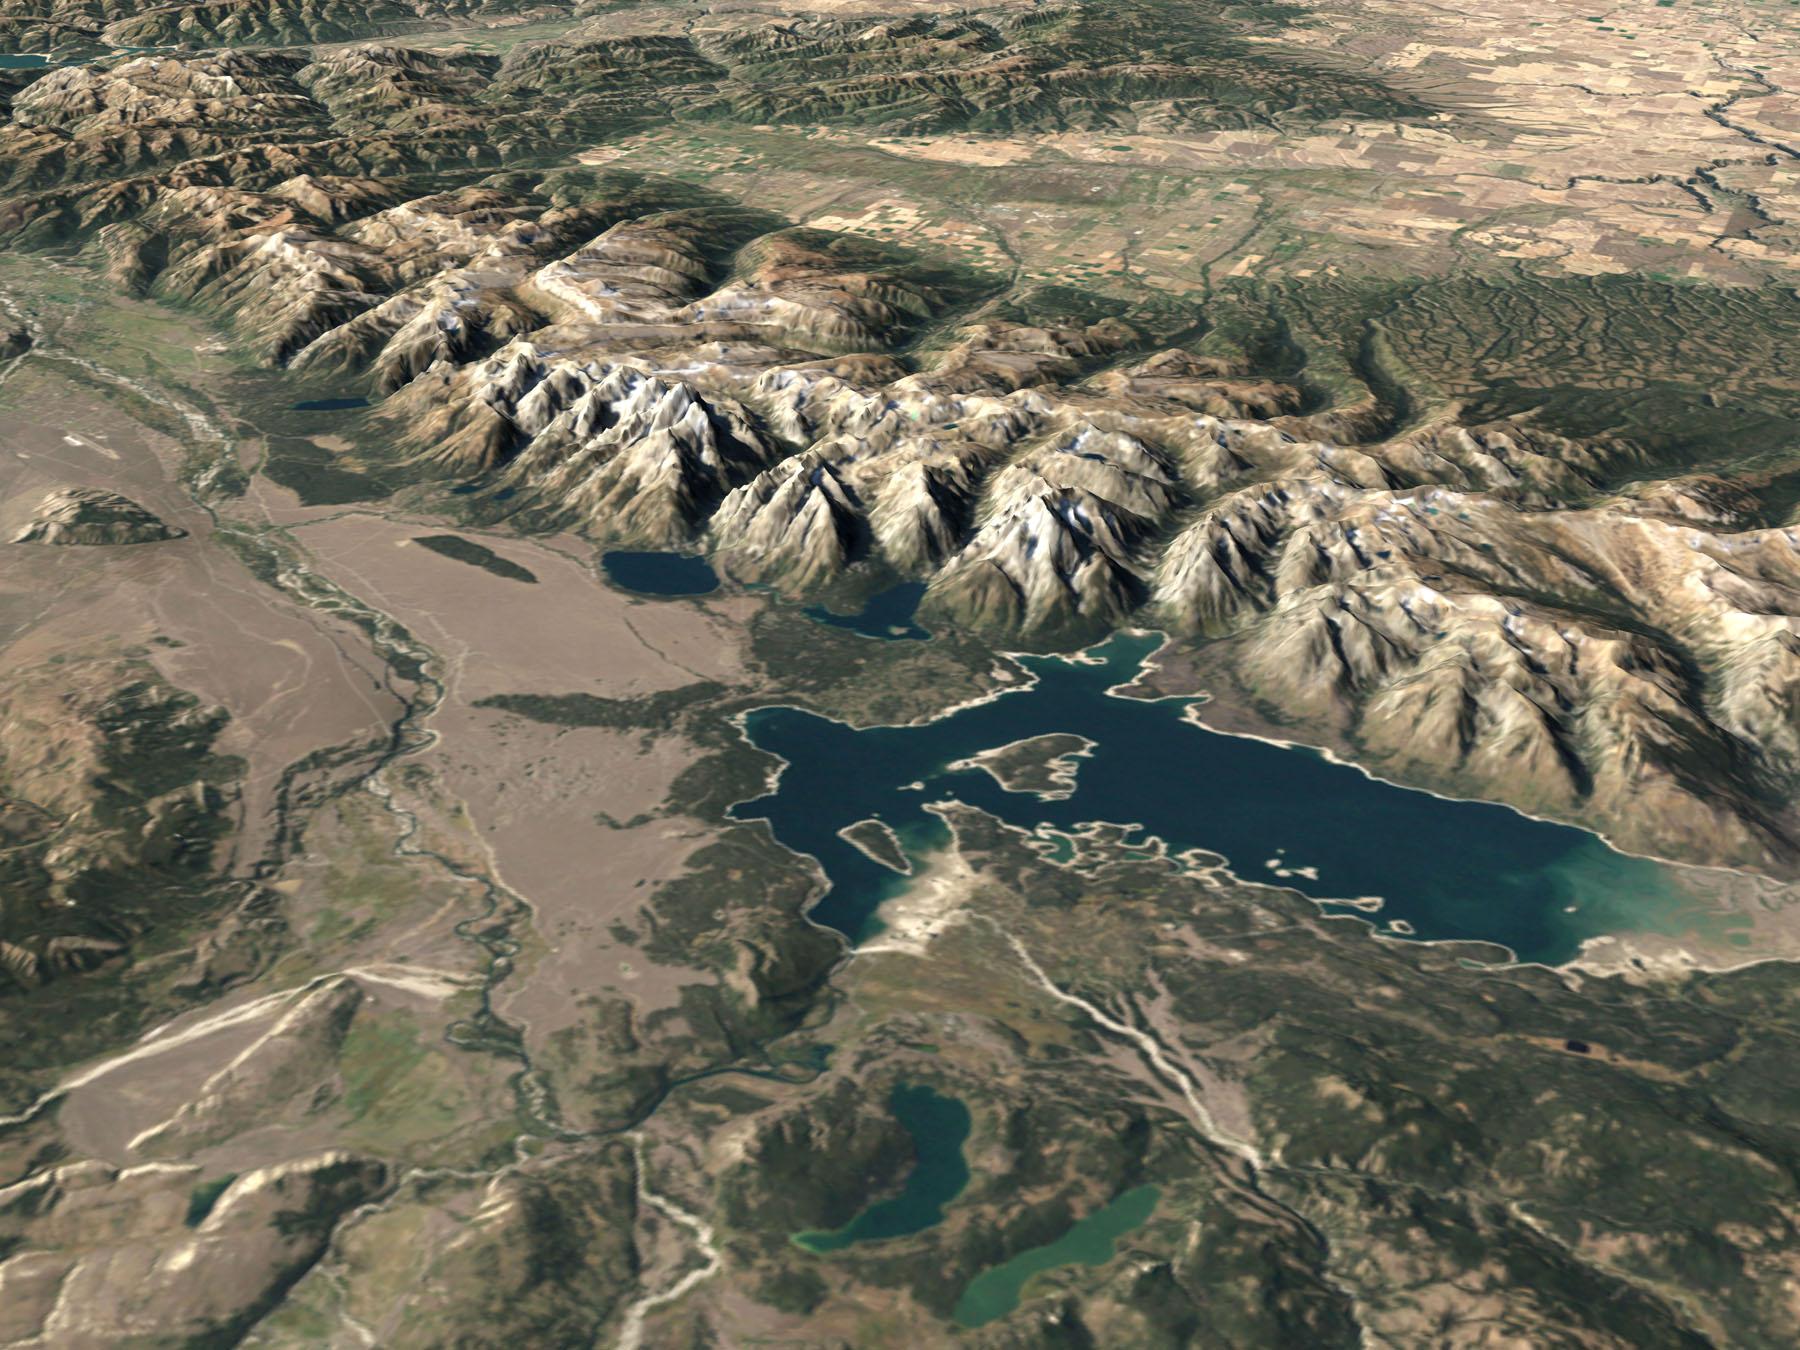 landsat_grand_teton NASA photo: NASA visualization of the Teton range and surrounding lakes